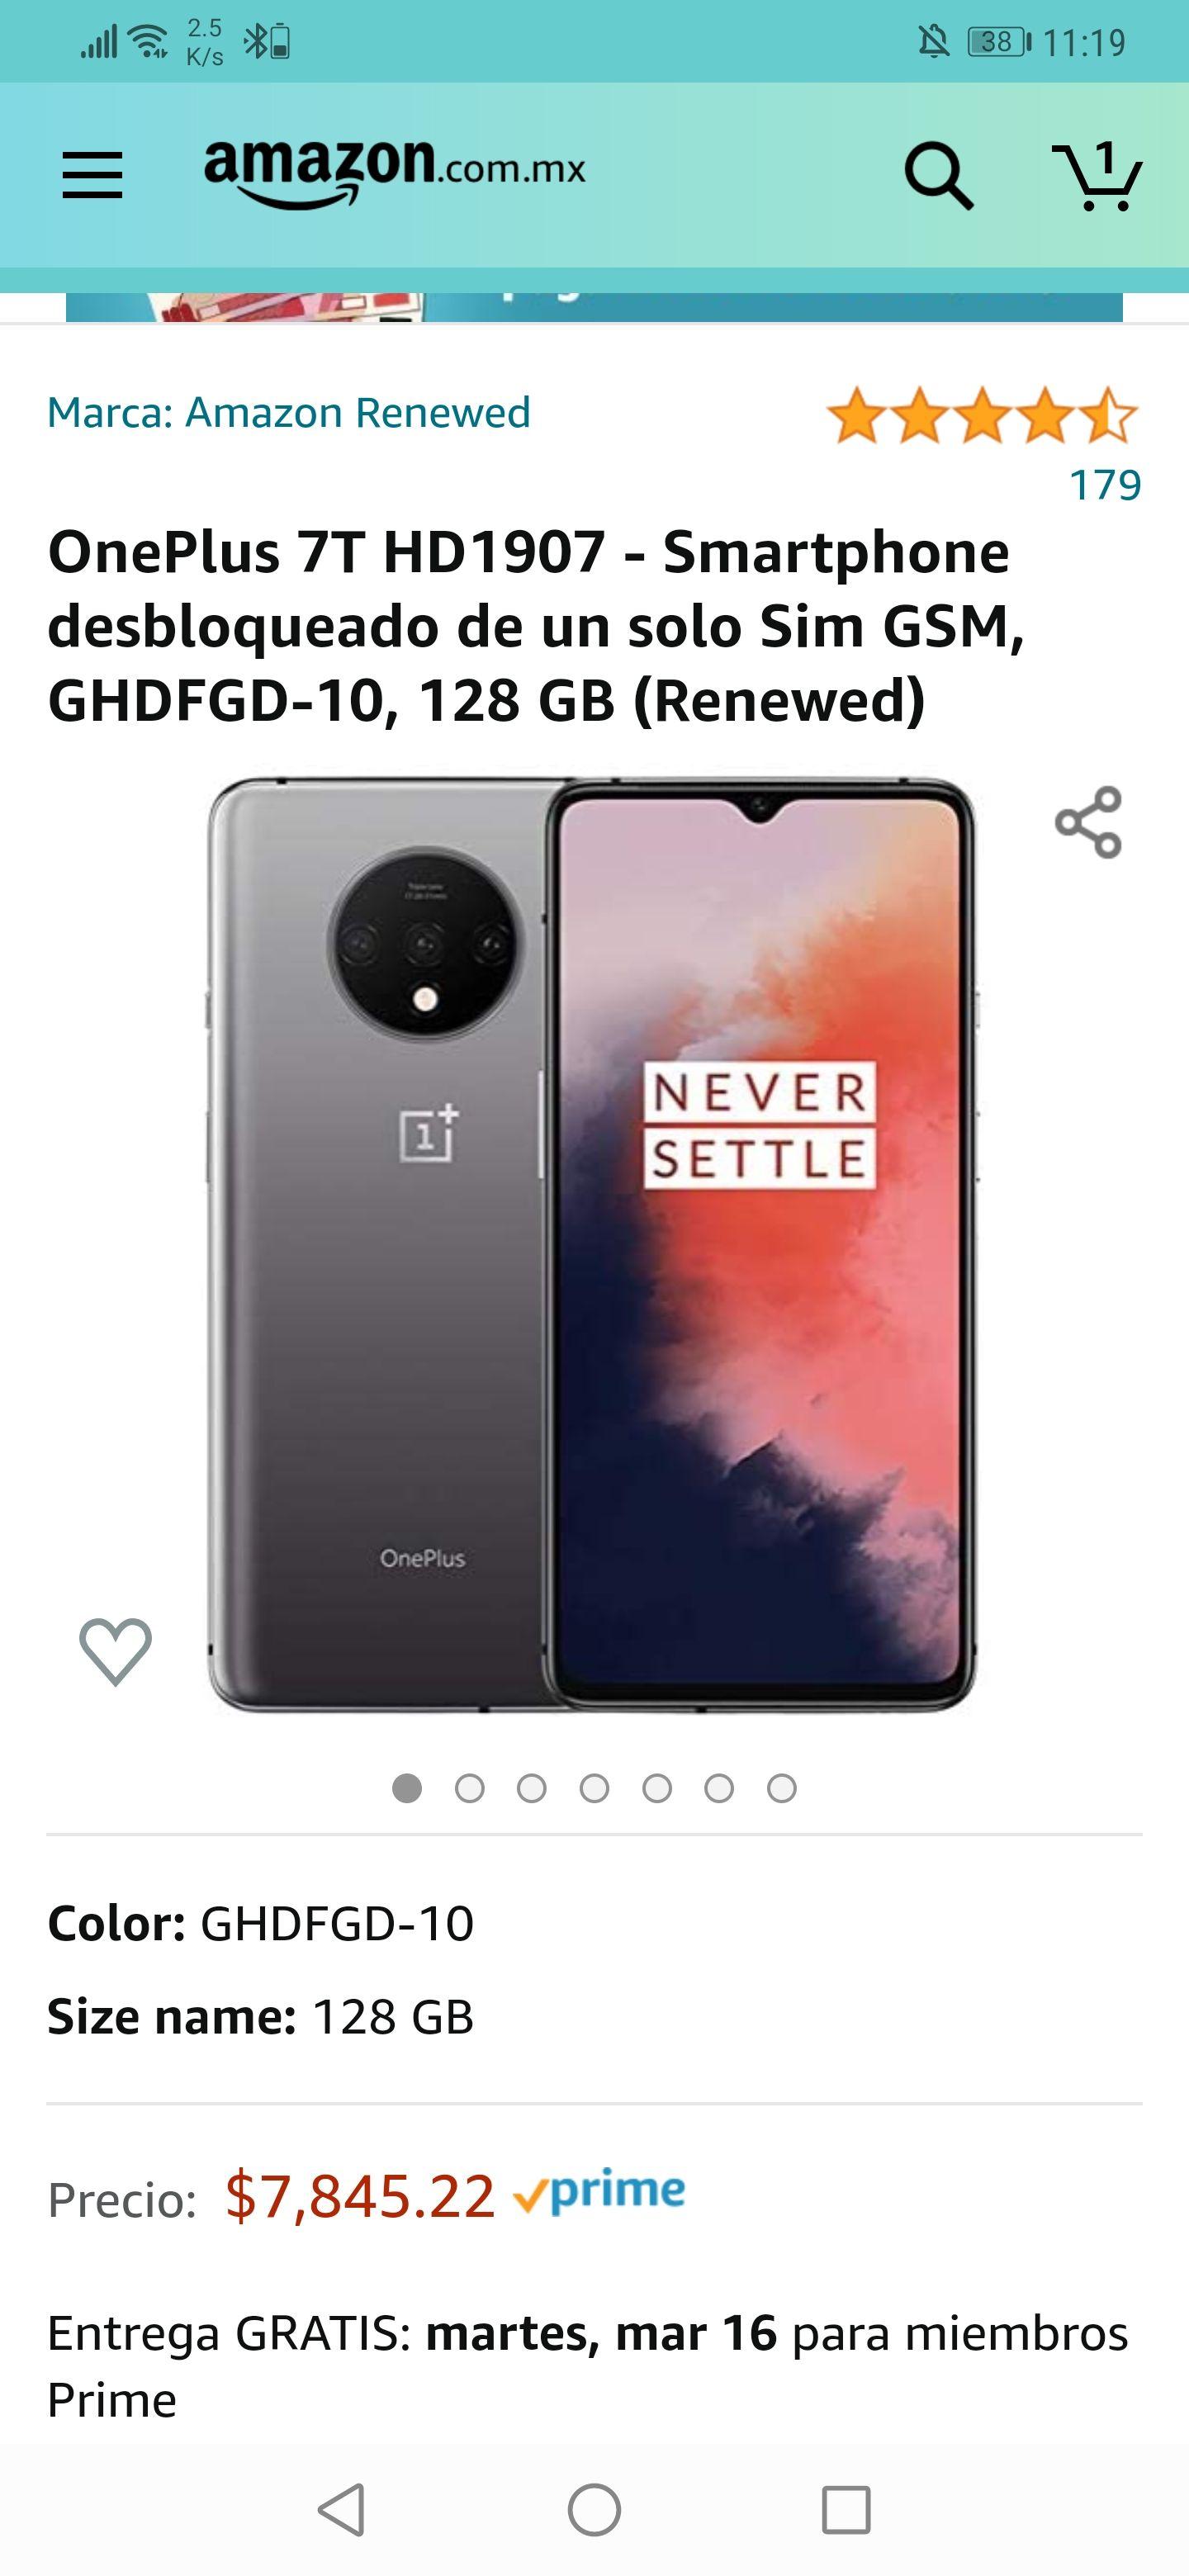 Amazon: OnePlus 7T Smartphone desbloqueado 128 GB (Renewed)